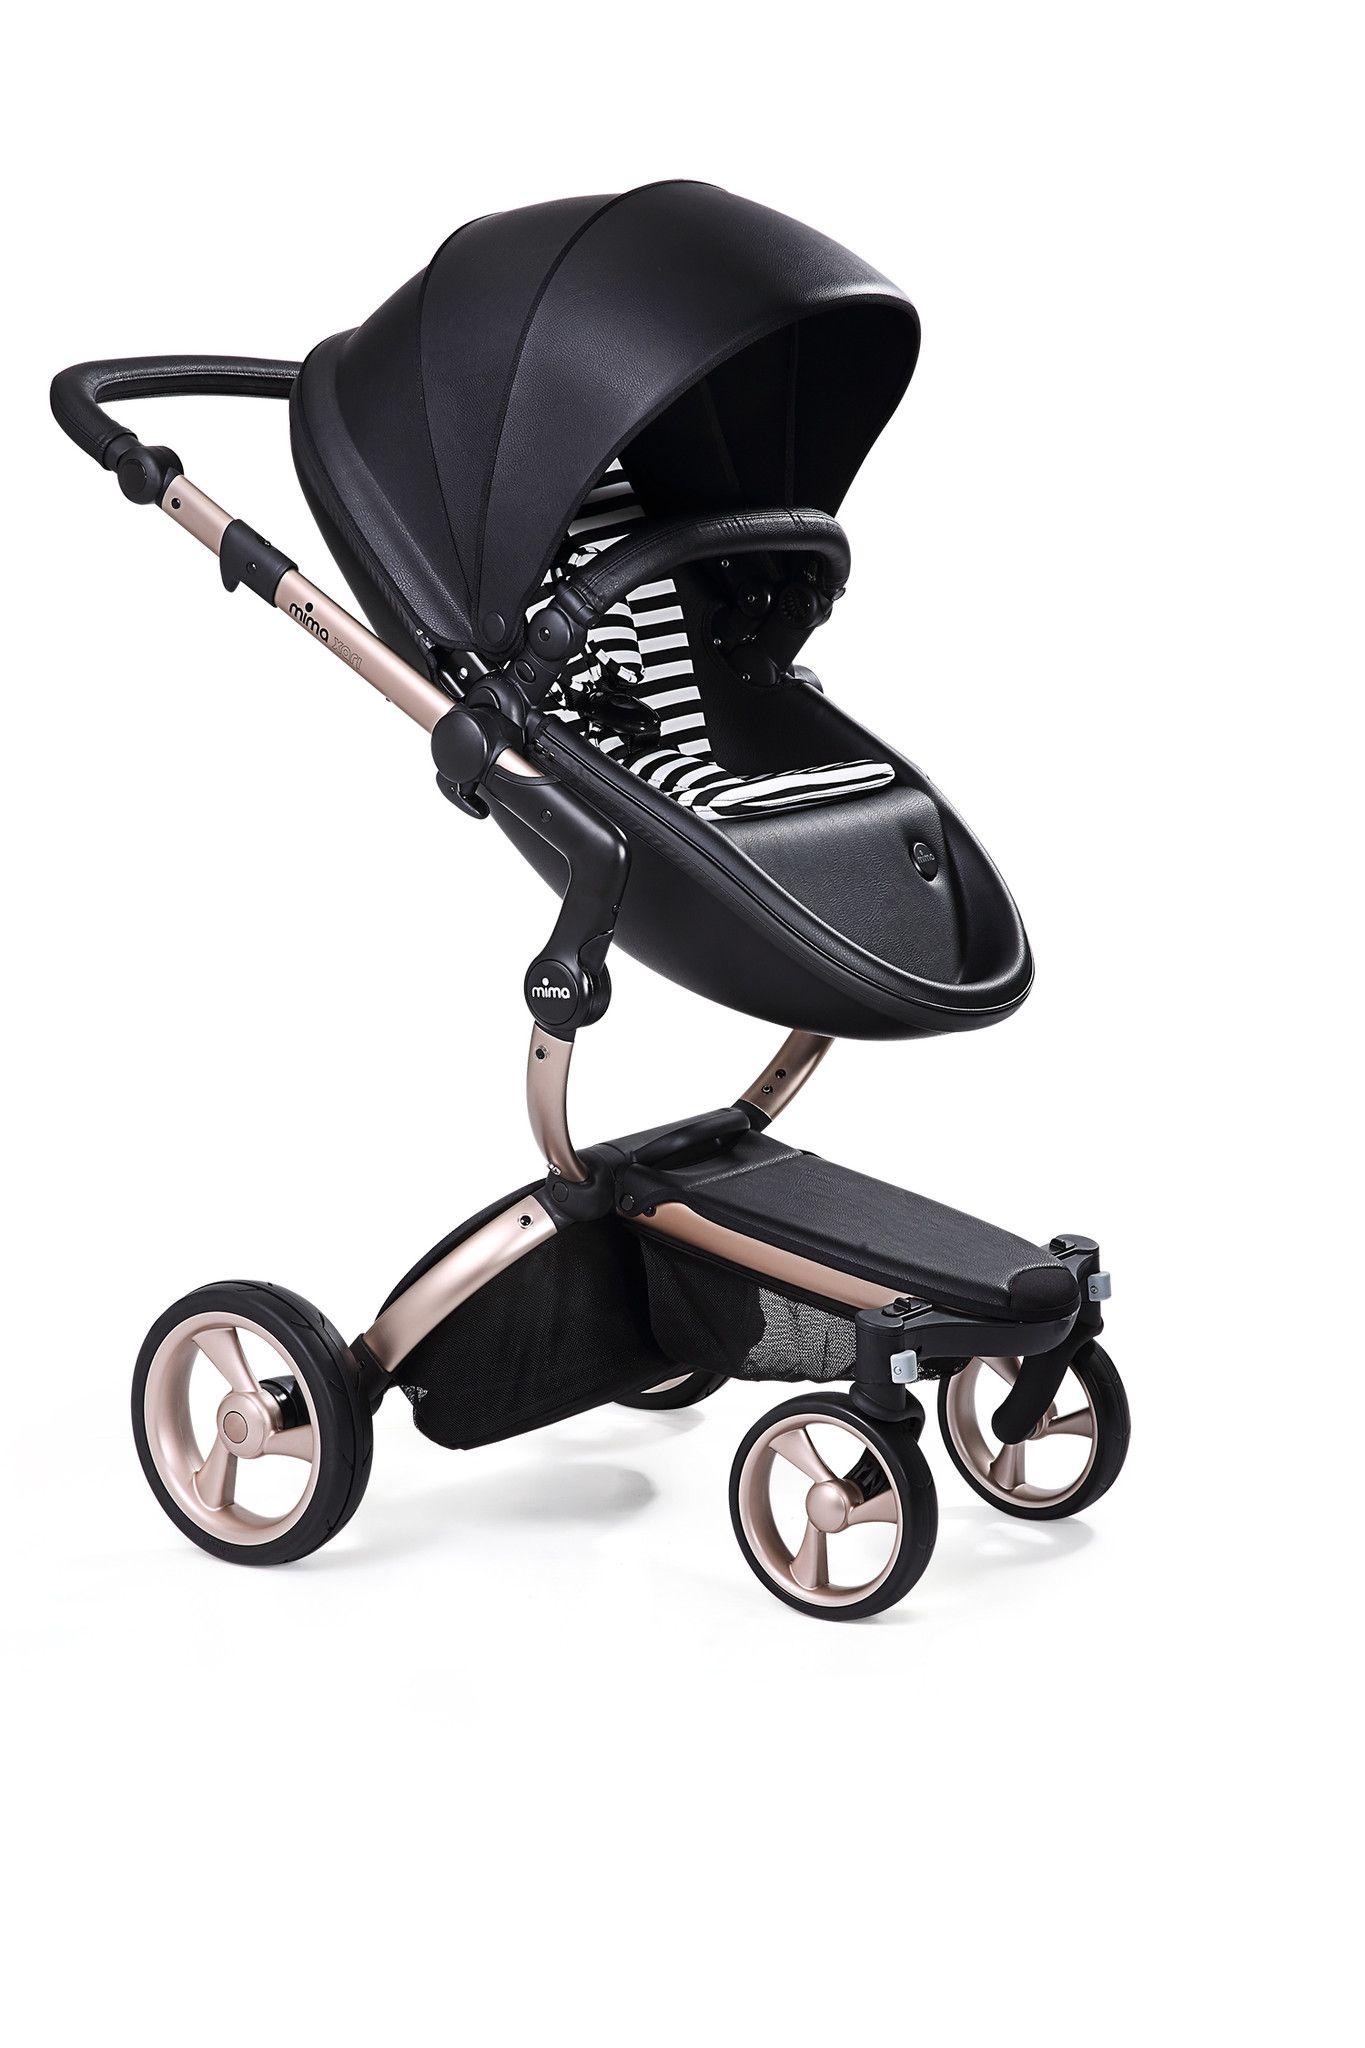 Mima Xari Black Seat, Black/White Starter Pack The